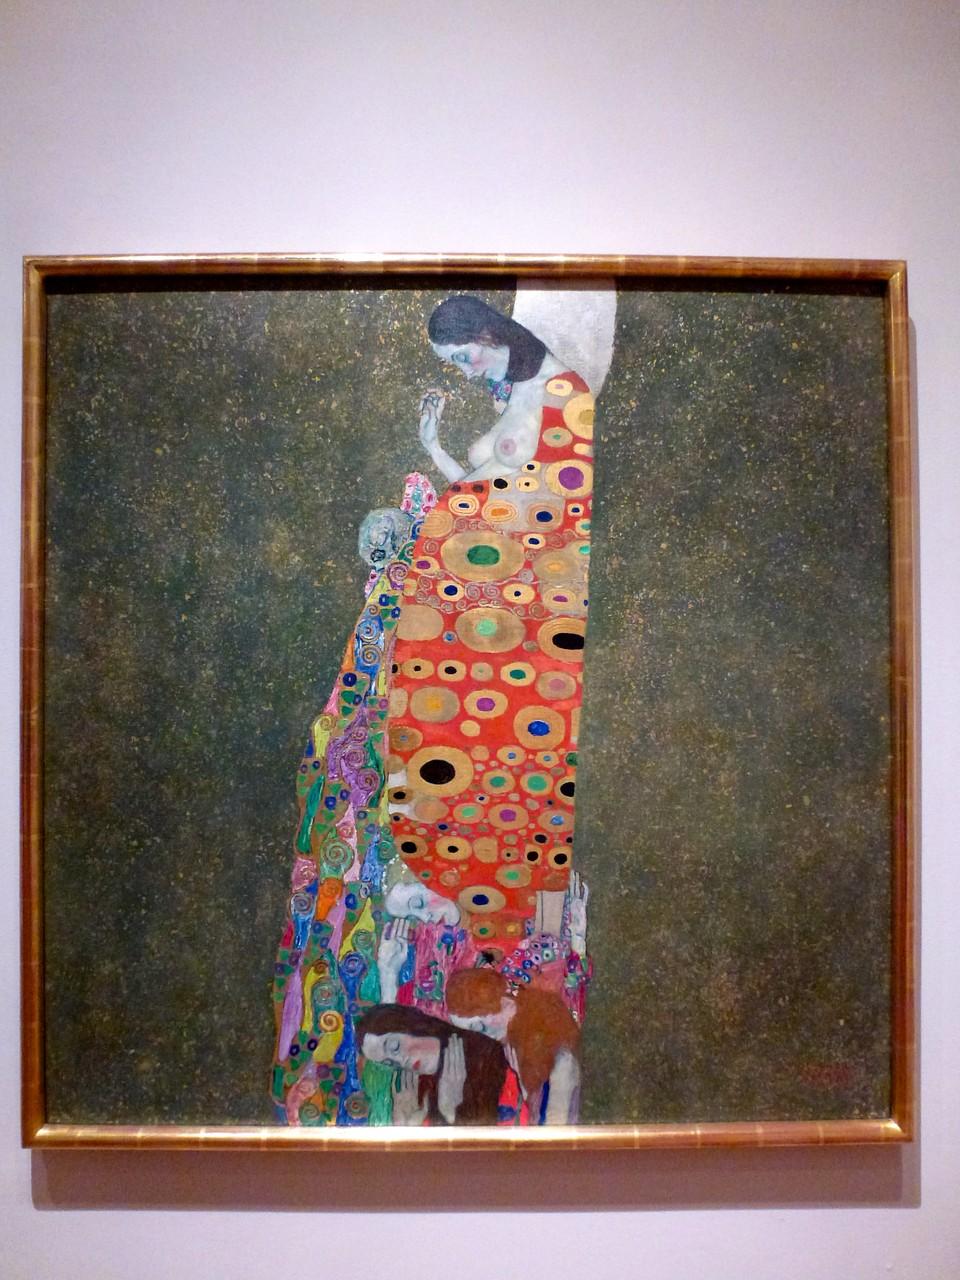 Gustav Klimt - Hope, II (1907-08)